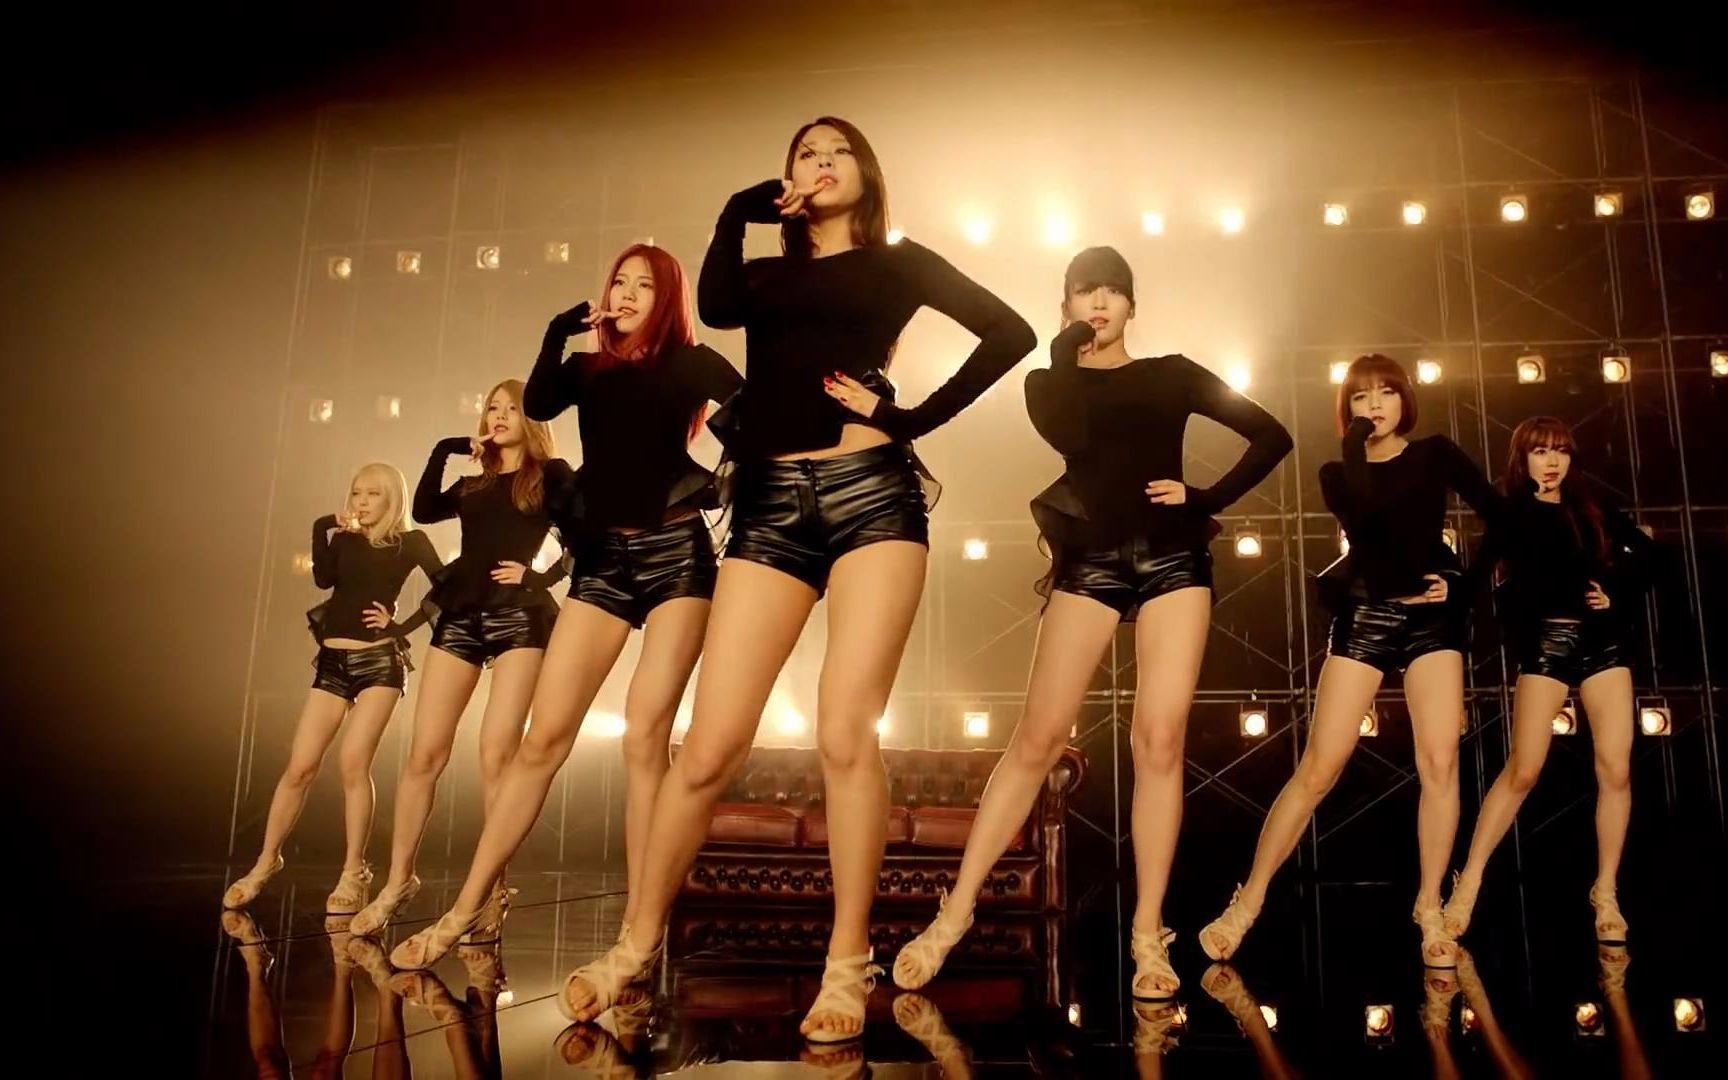 http://v.youku.com/v_show/id_XMTc1NDUxNzg2MA==.html